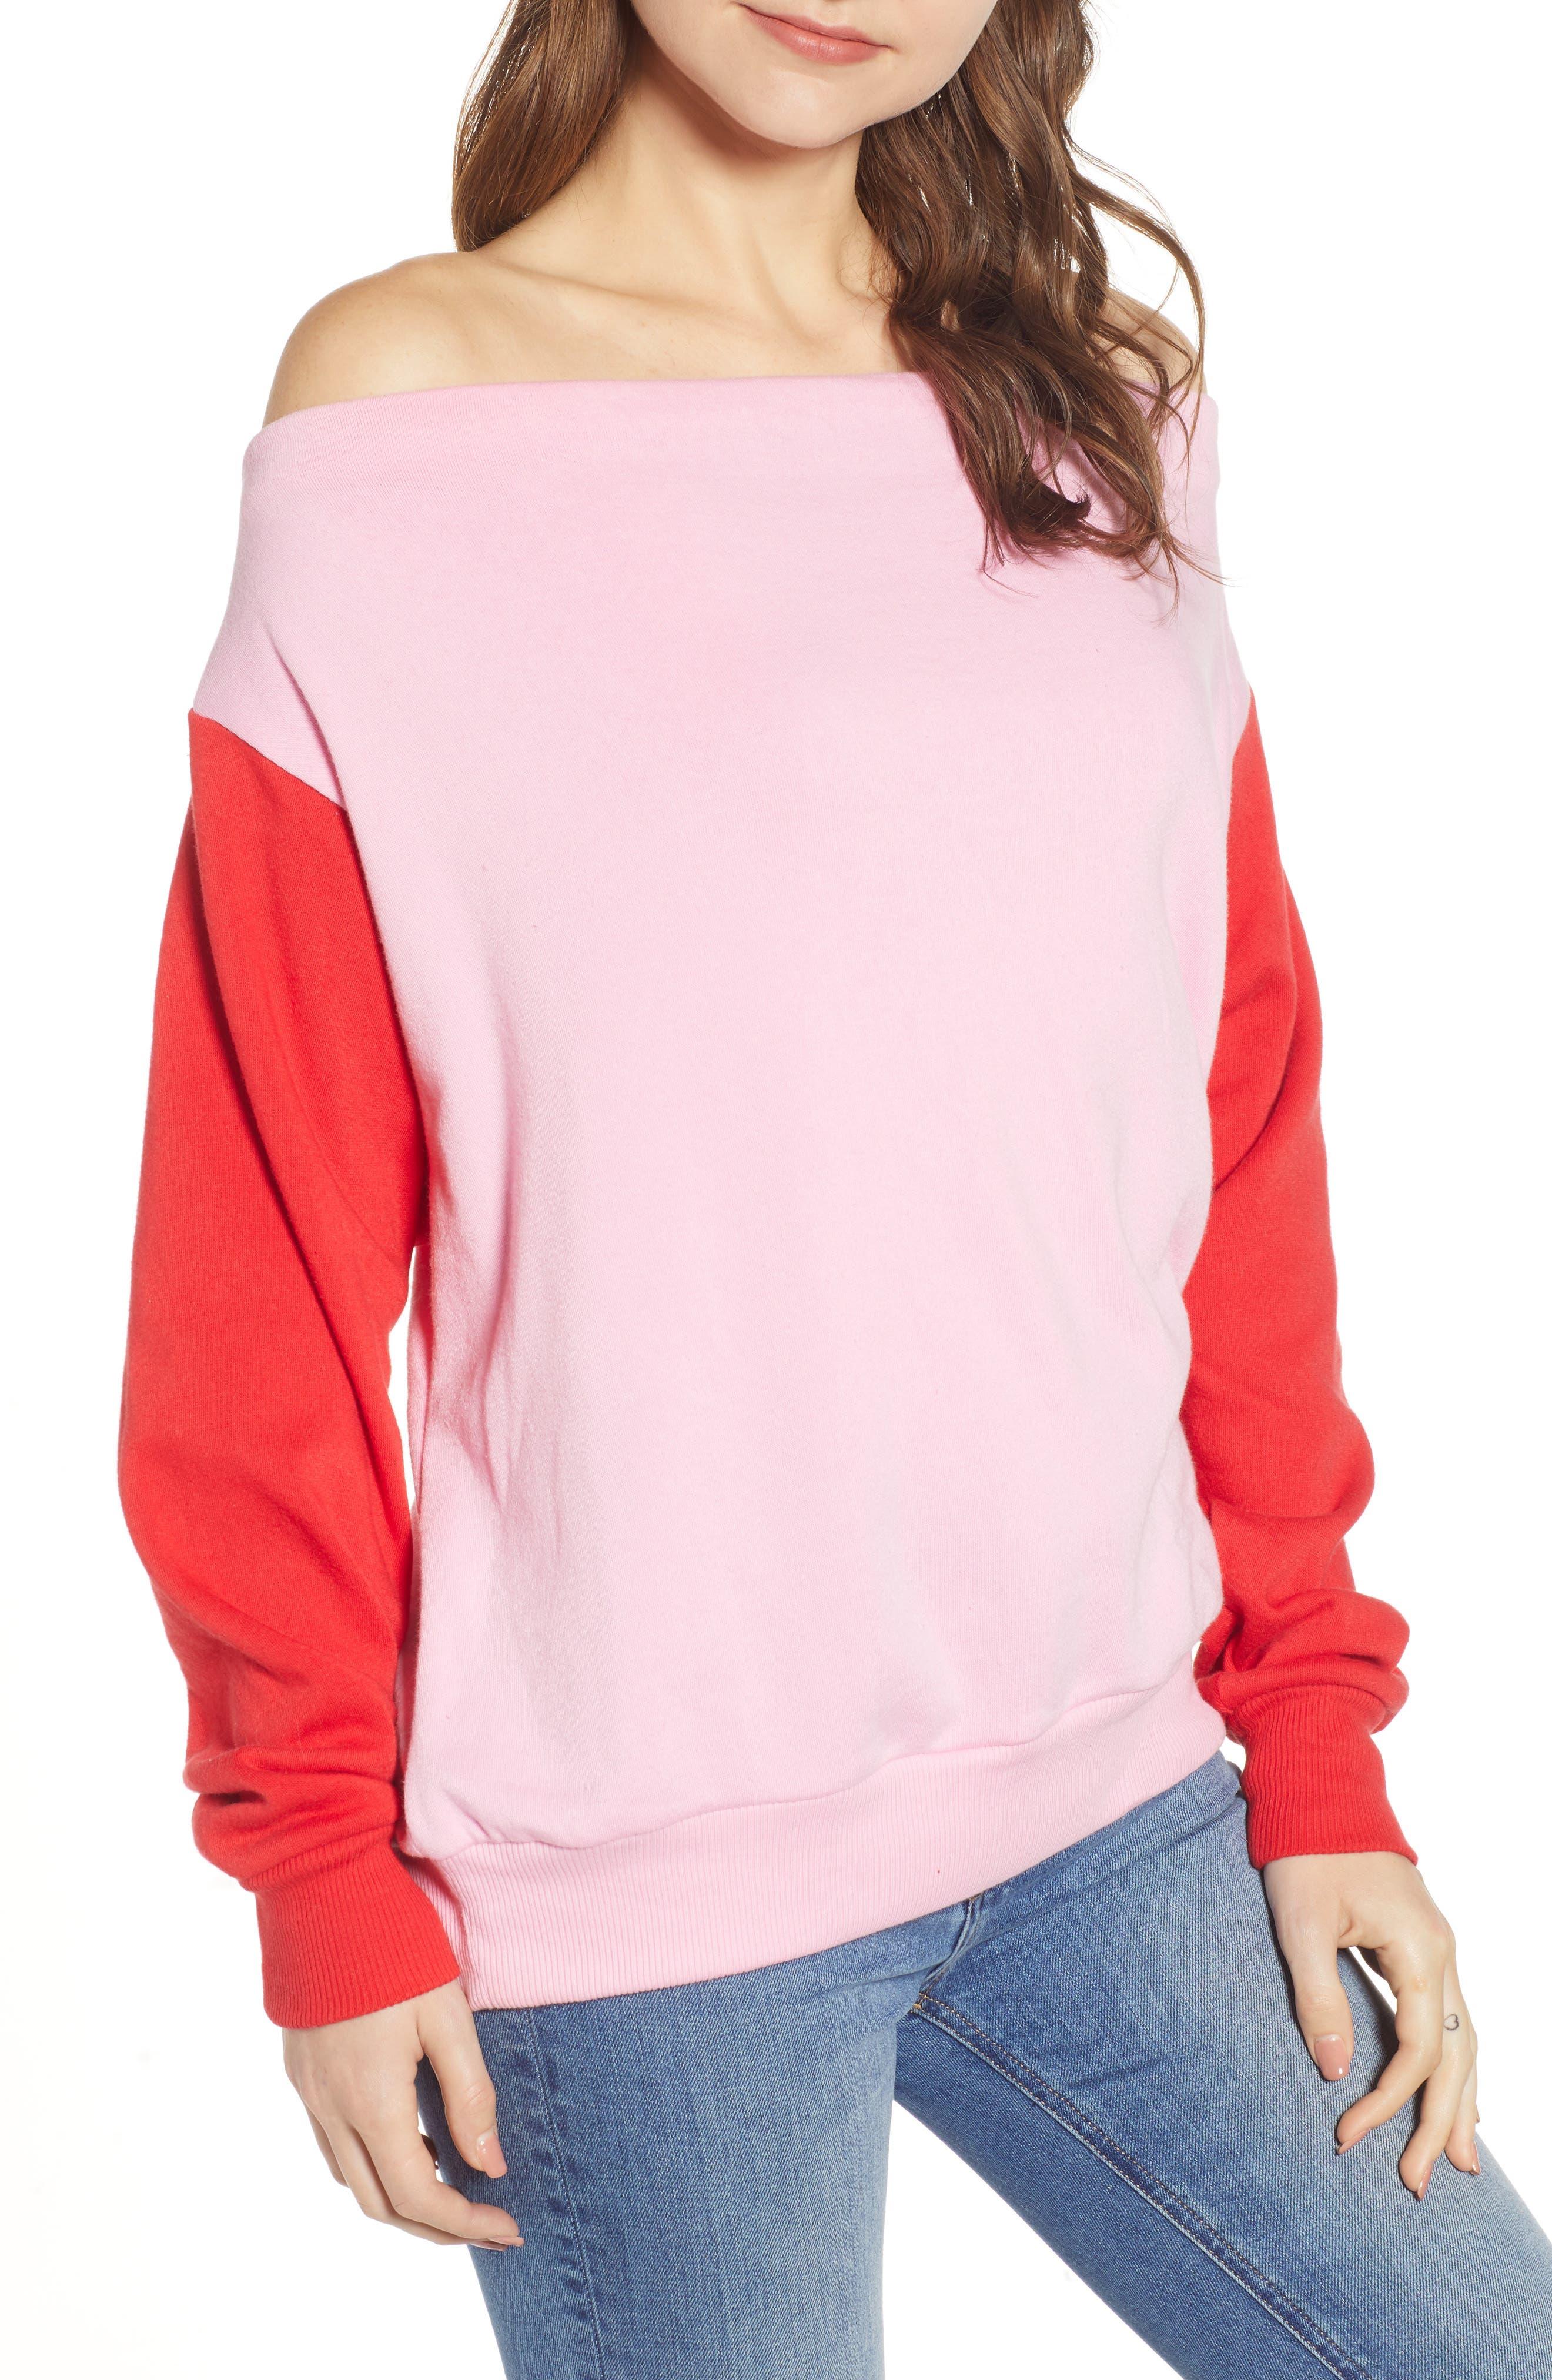 Colorblock Fleece Sweatshirt,                         Main,                         color, PINK PRISM